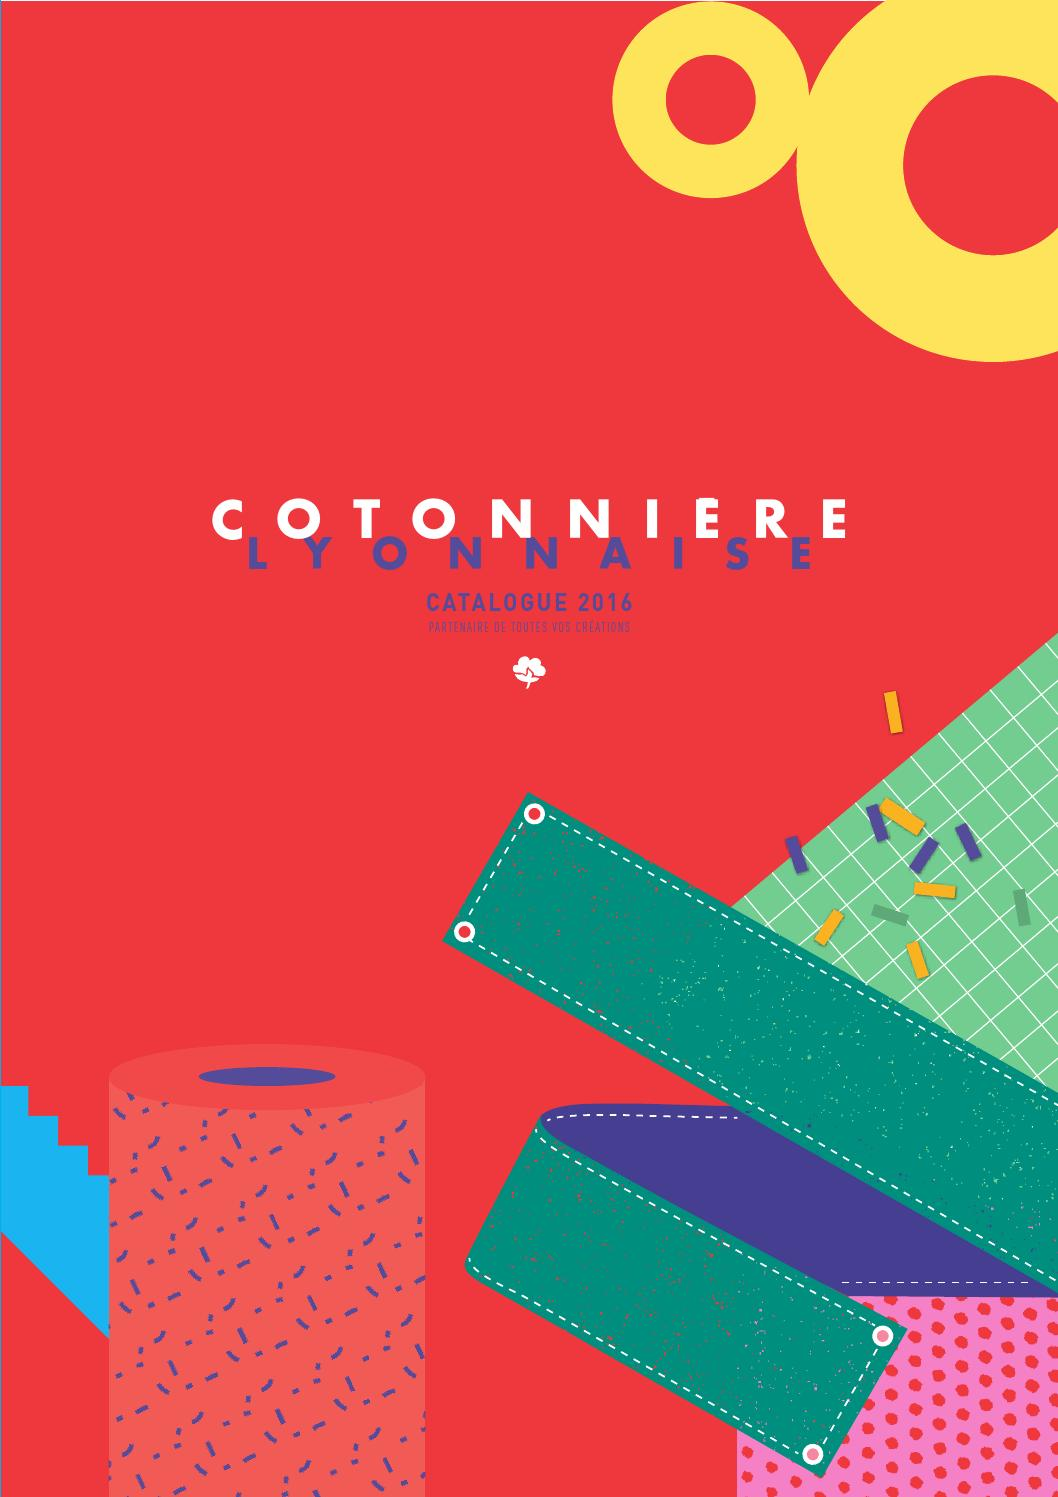 CATALOGUE issuu COTONNIÈRE LYONNAISE by 2016 extra N8vmn0w